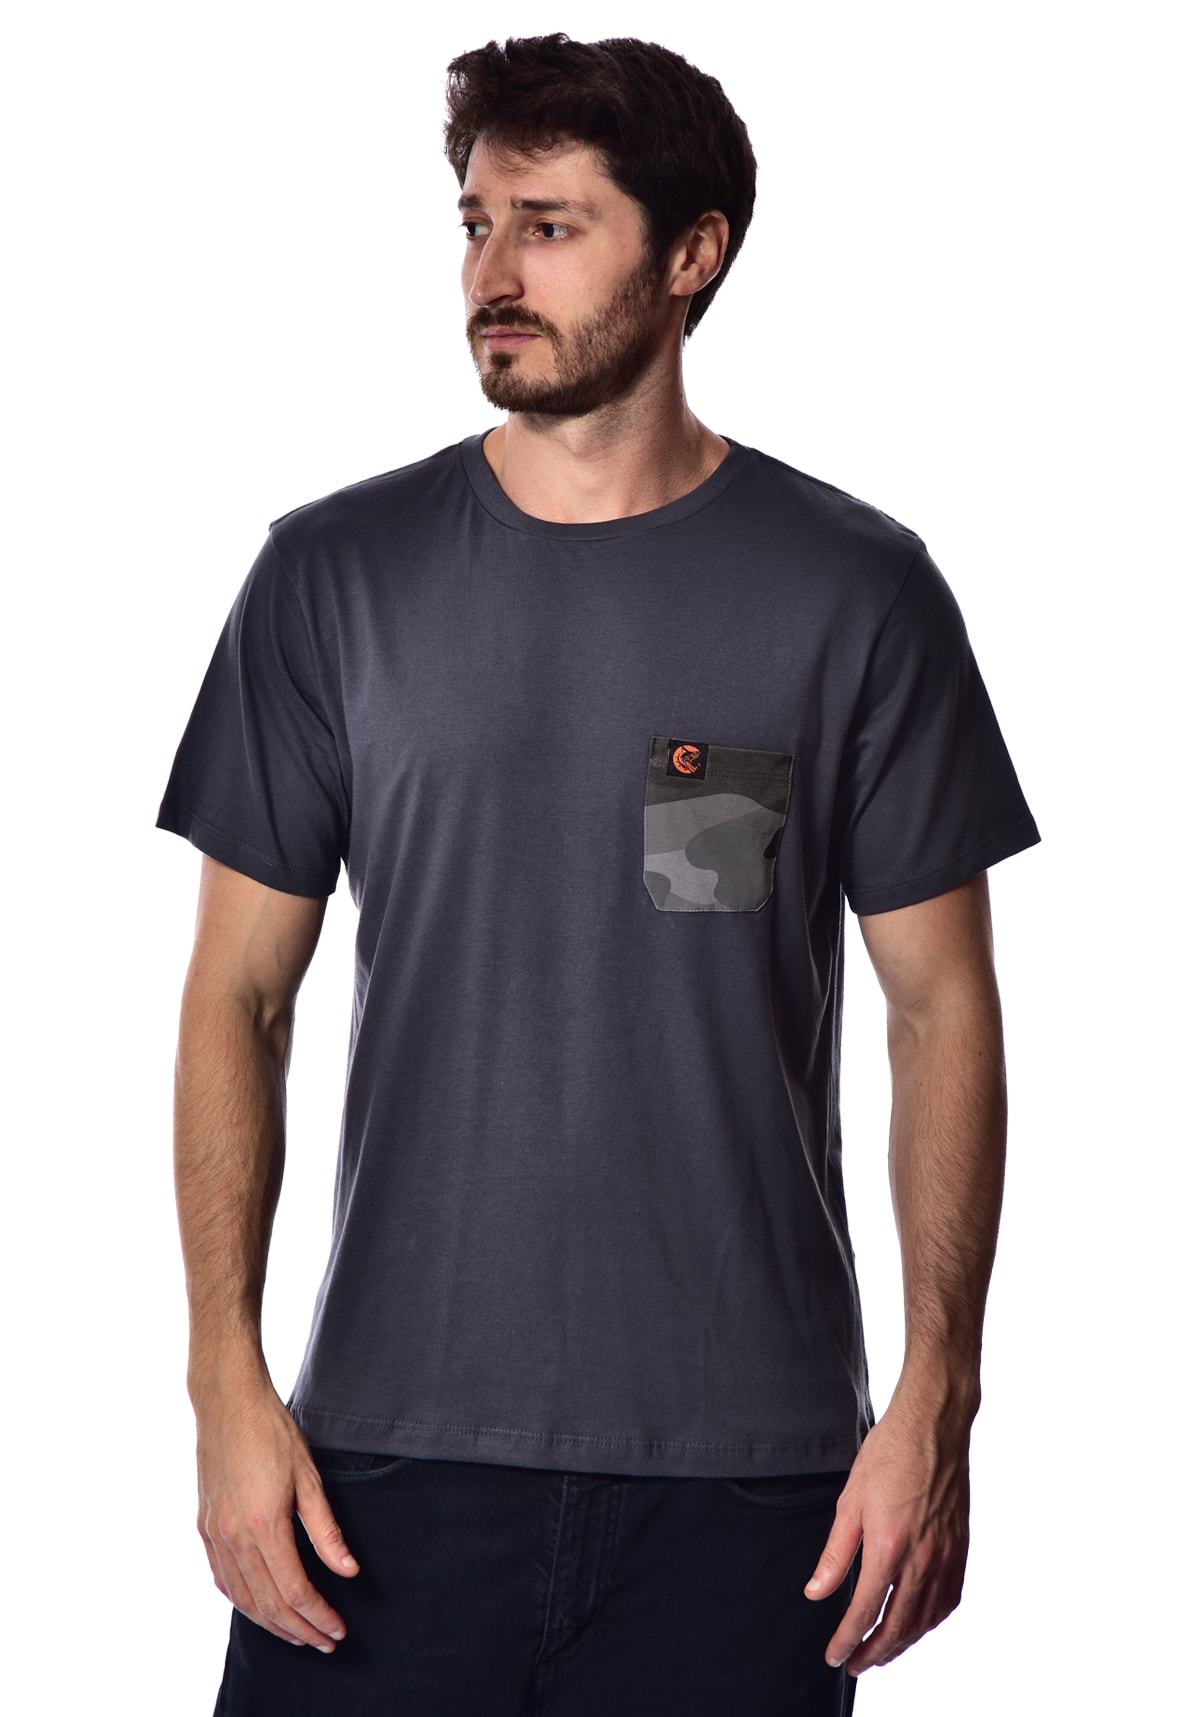 Camiseta RN Bolso Camuflado - Chumbo P